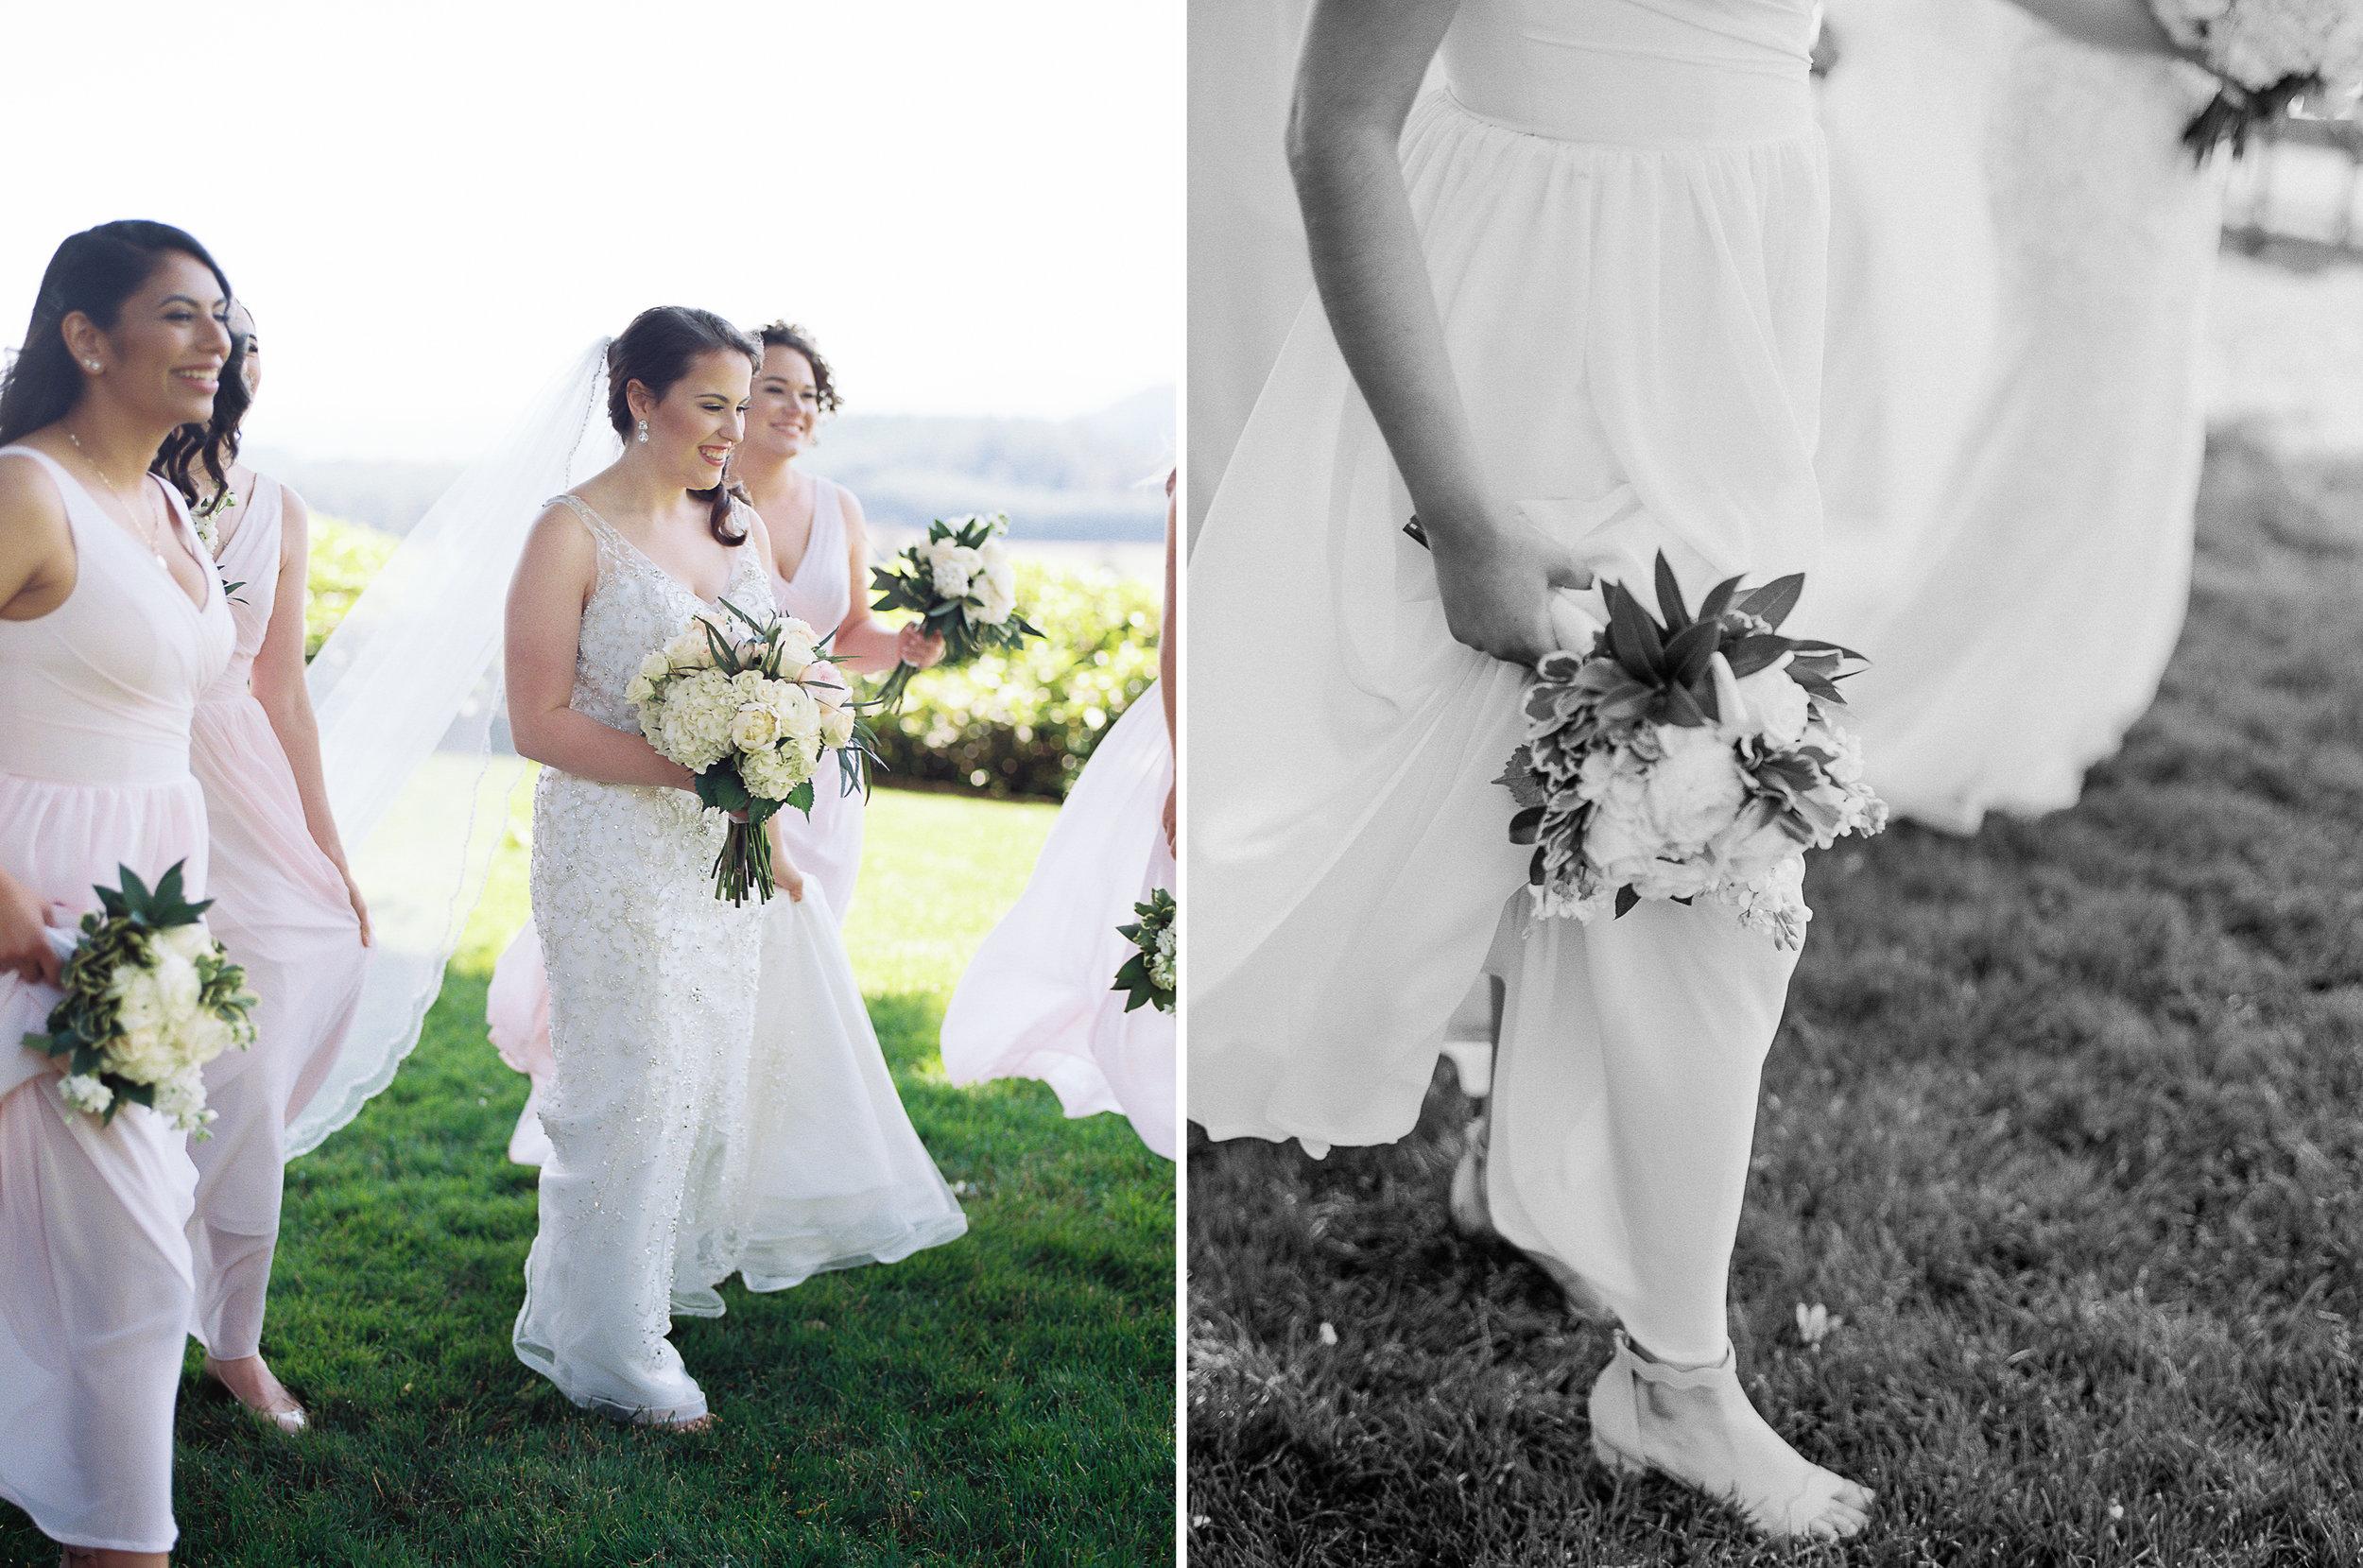 romantic-willamette-valley-vineyard-wedding-7.jpg